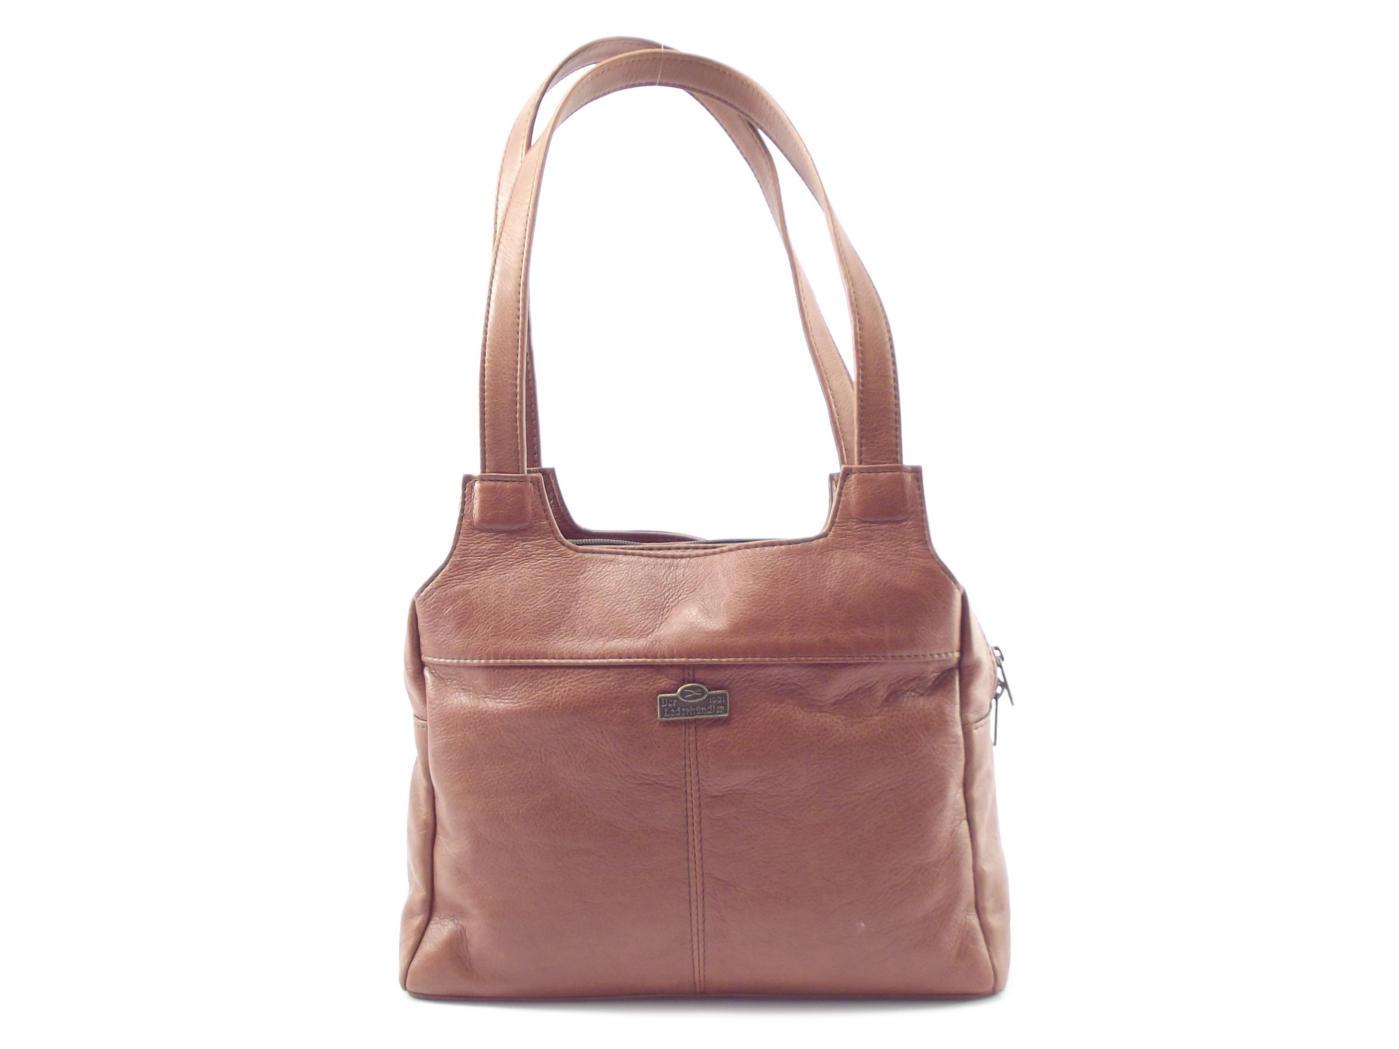 bc612907decf ... Handbags Women  Double strap ladies leather shoulder handbag Der  Lederhandl outlet store b39f4 ad898 ...